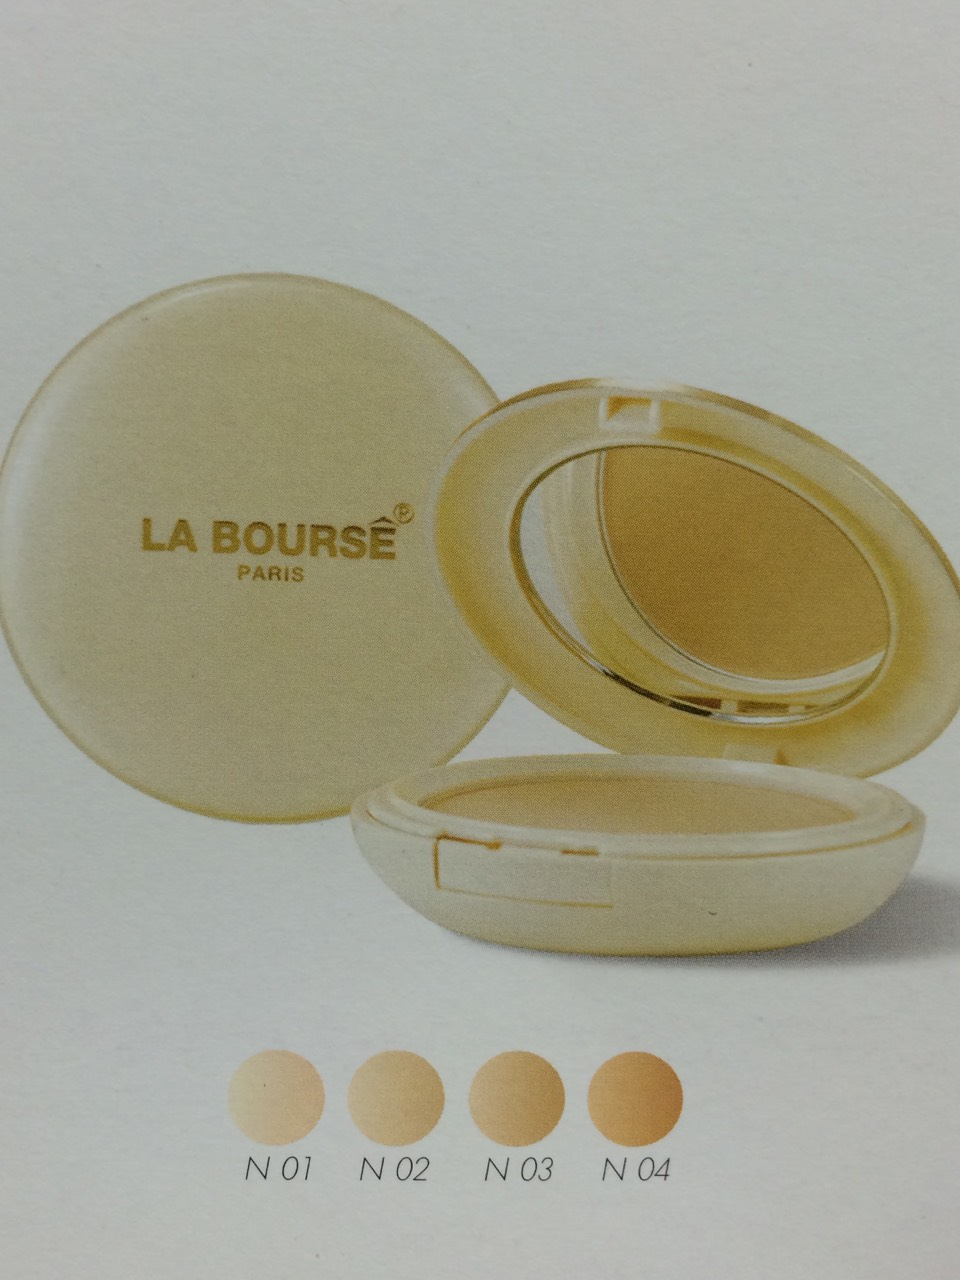 La Bourse Whitening Powder Cake UV ProtectionWith Ginseng Extract + Vitamin C & E